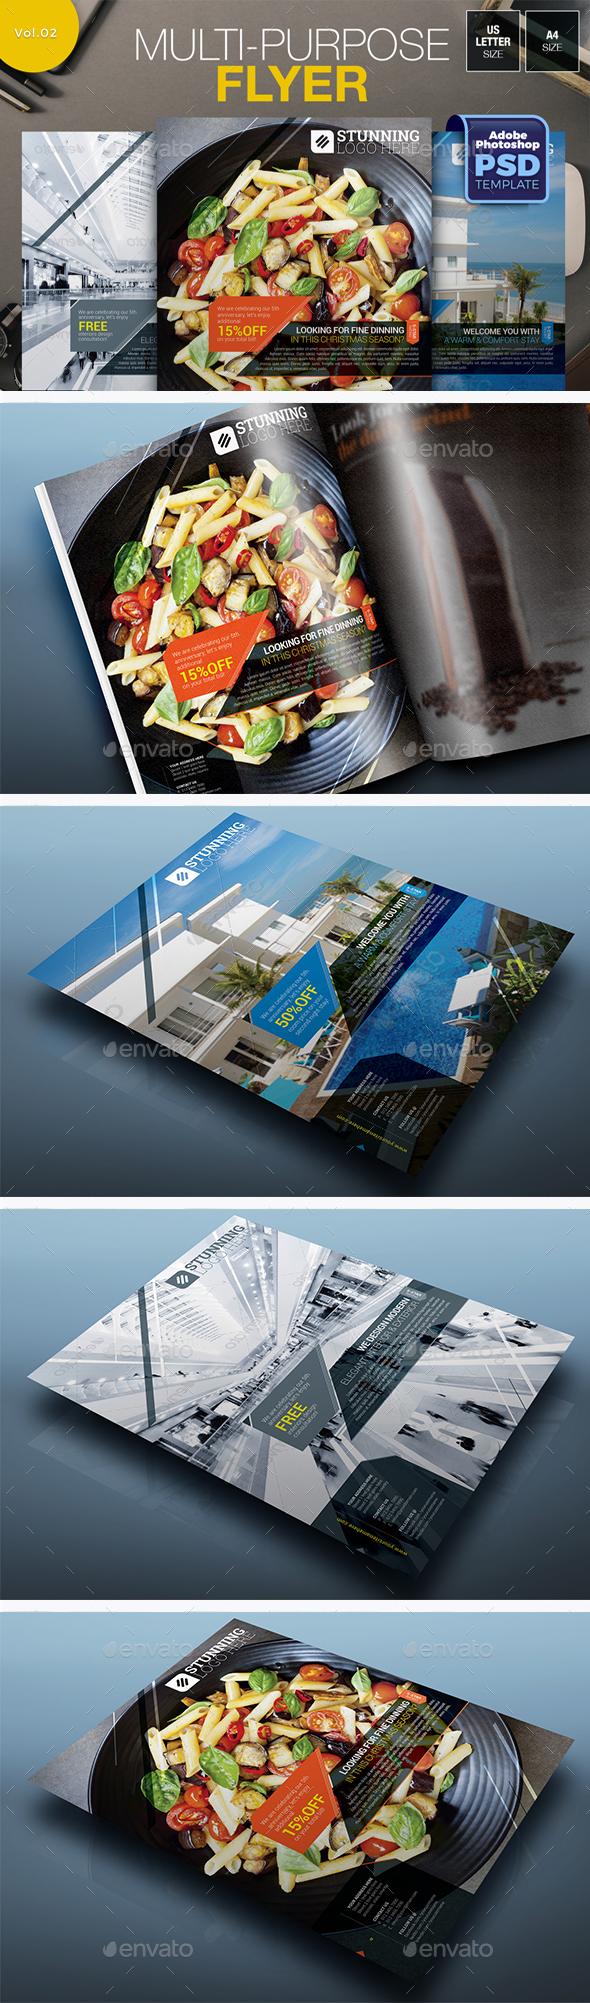 Multipurpose Flyer Vol.02 - Miscellaneous Events